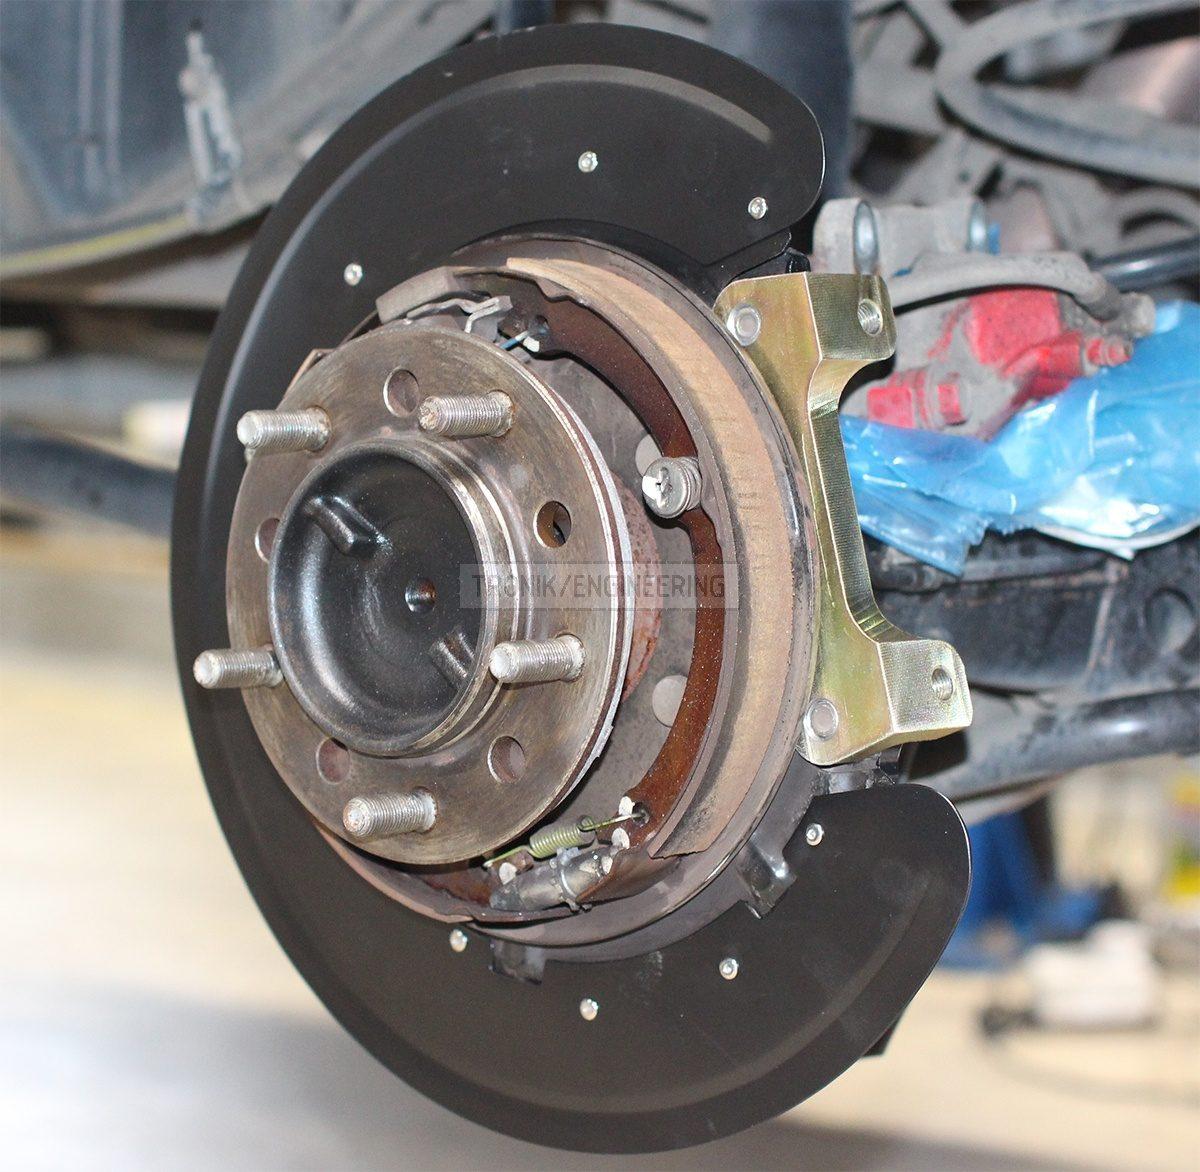 rear brake rotr protection & caliper adapter pic 2